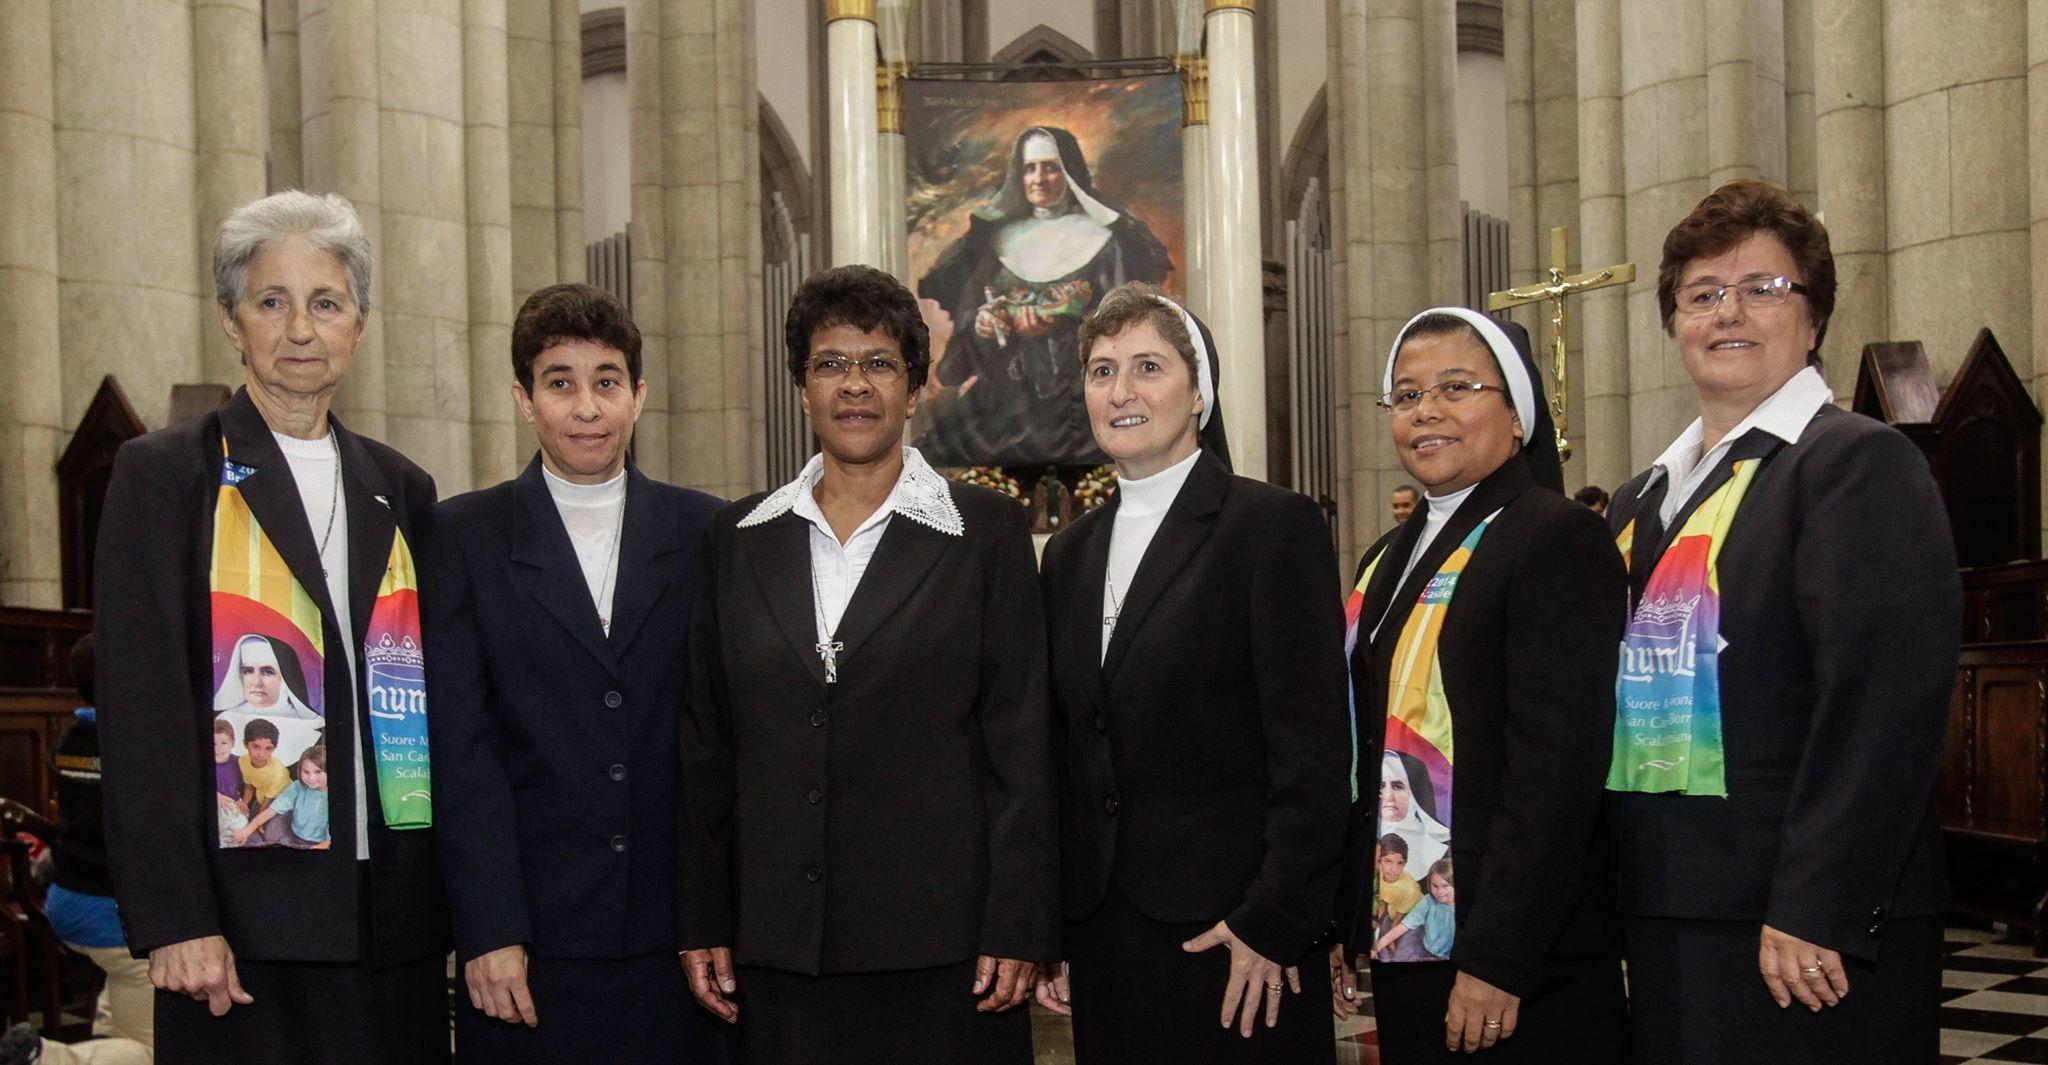 suore missionarie scalabriniane